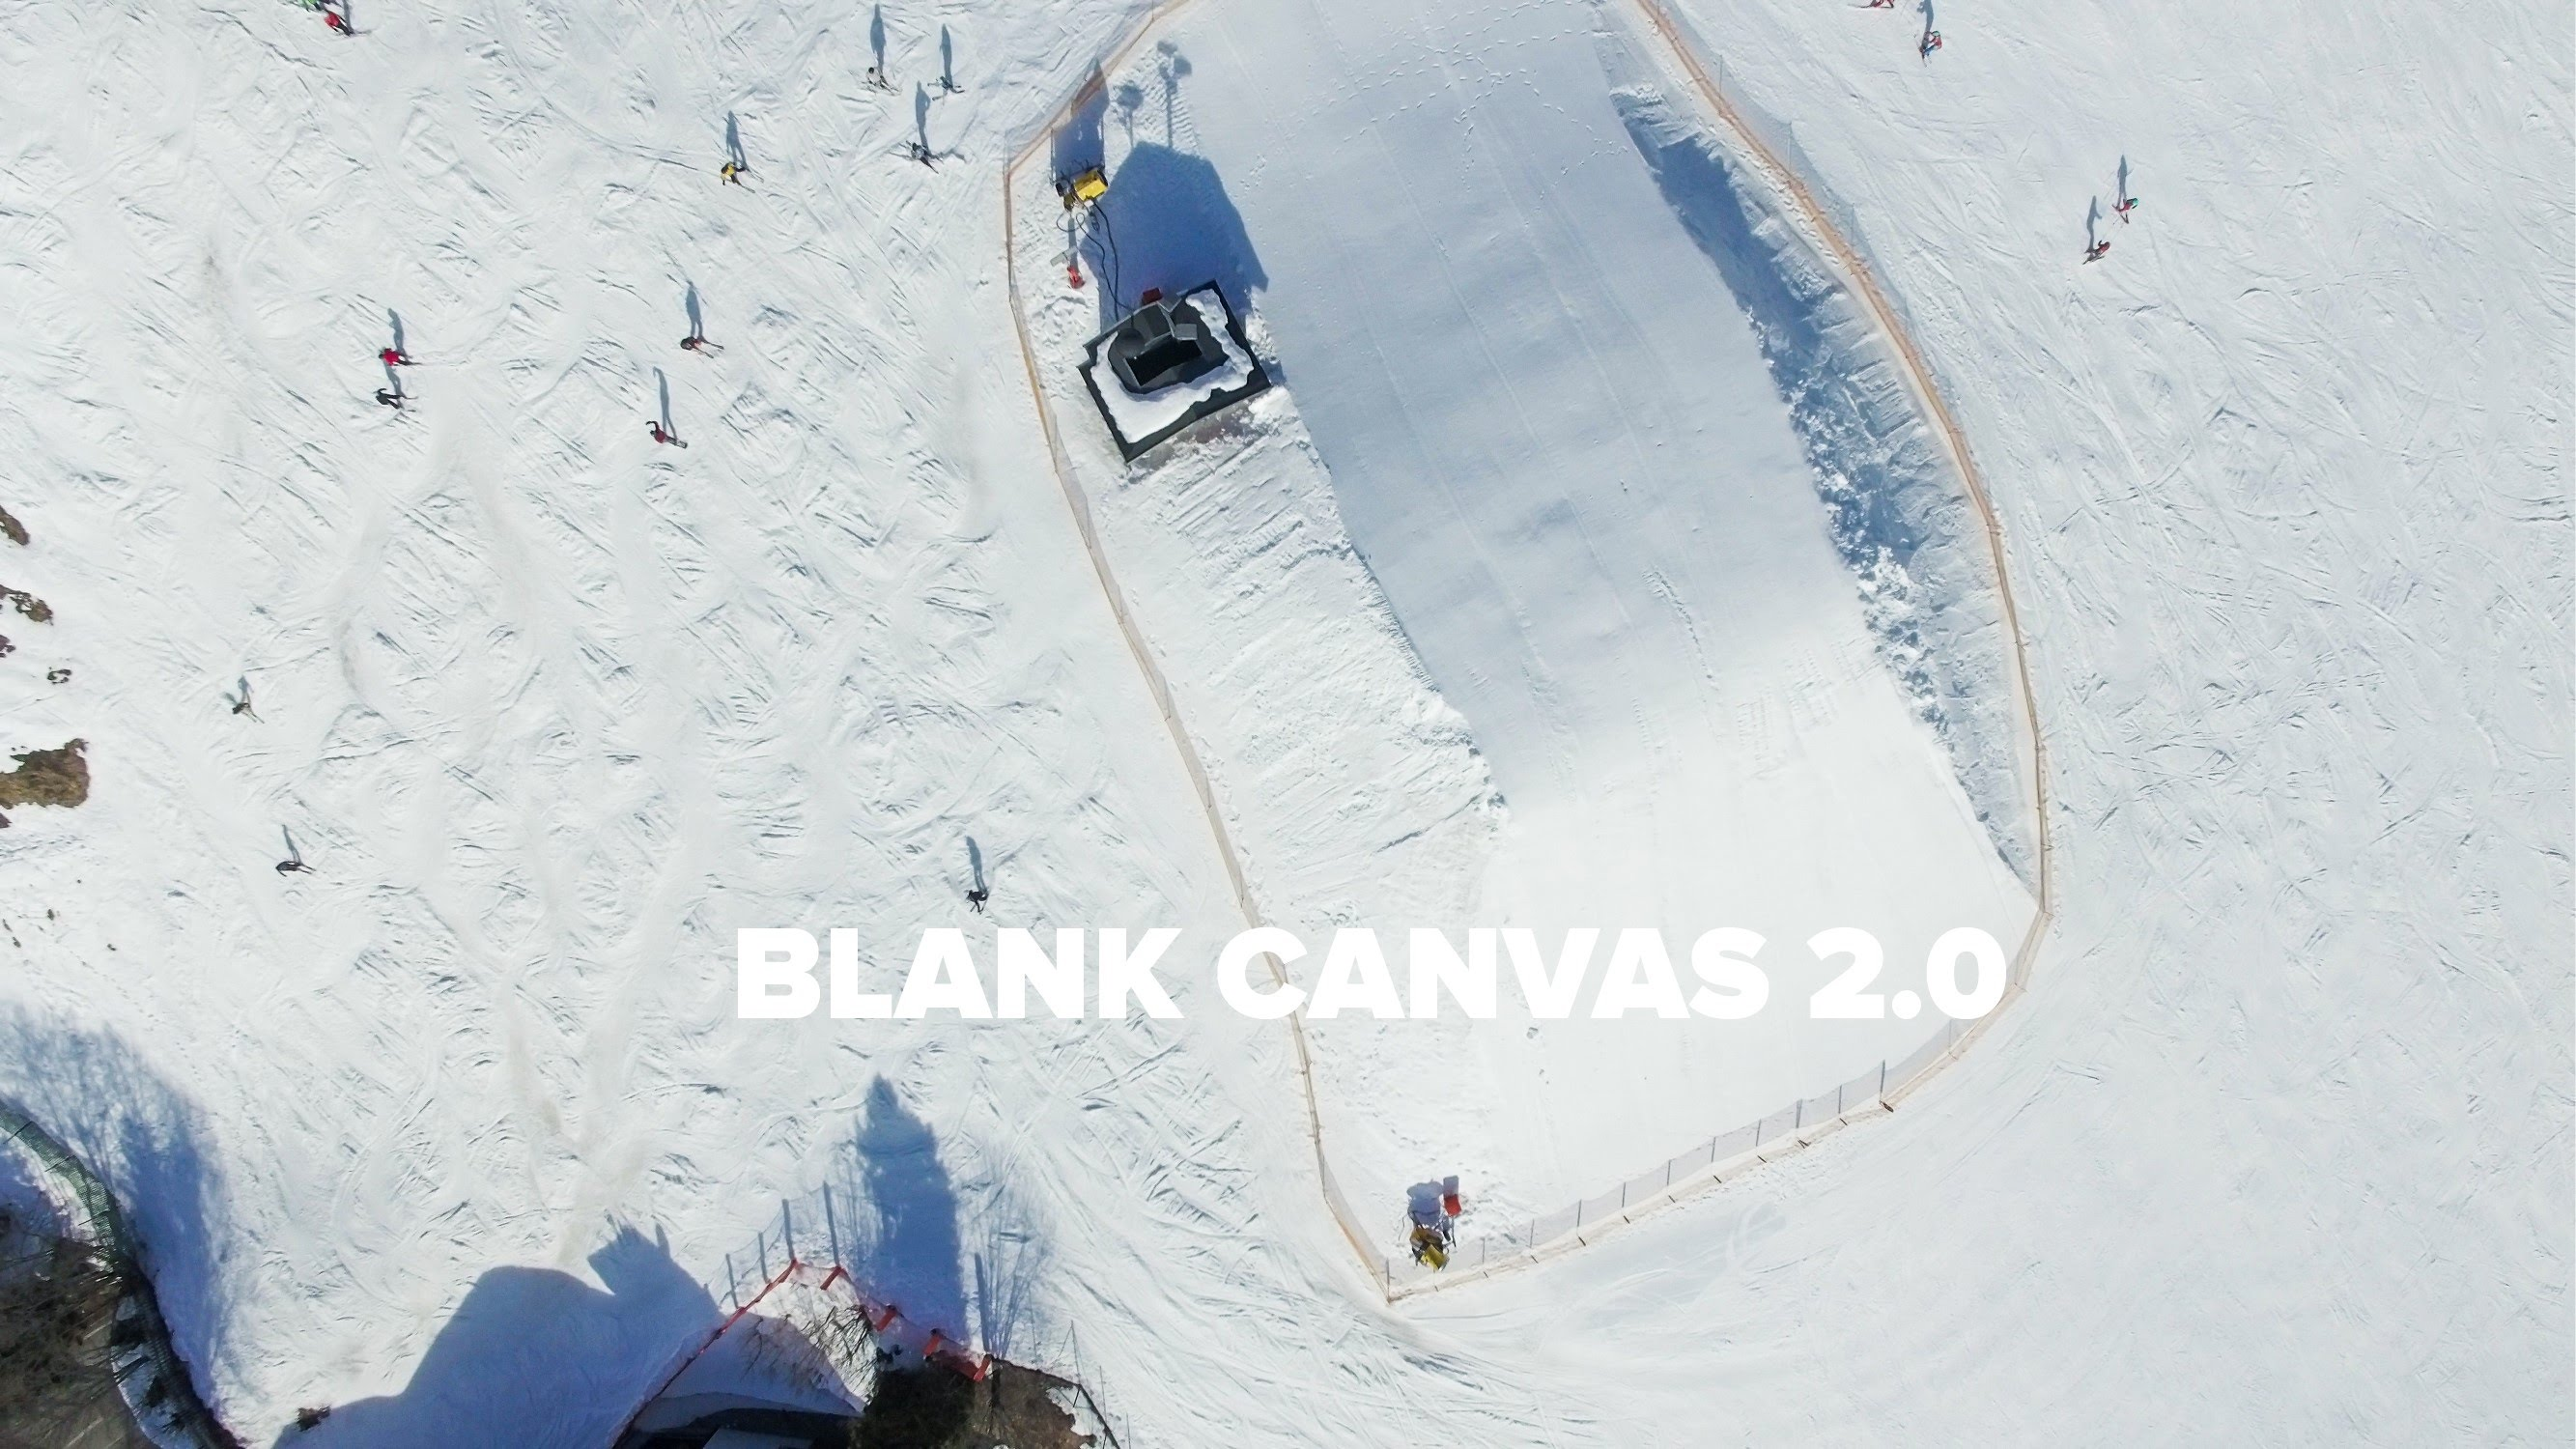 Atomic I Blank Canvas 2.0